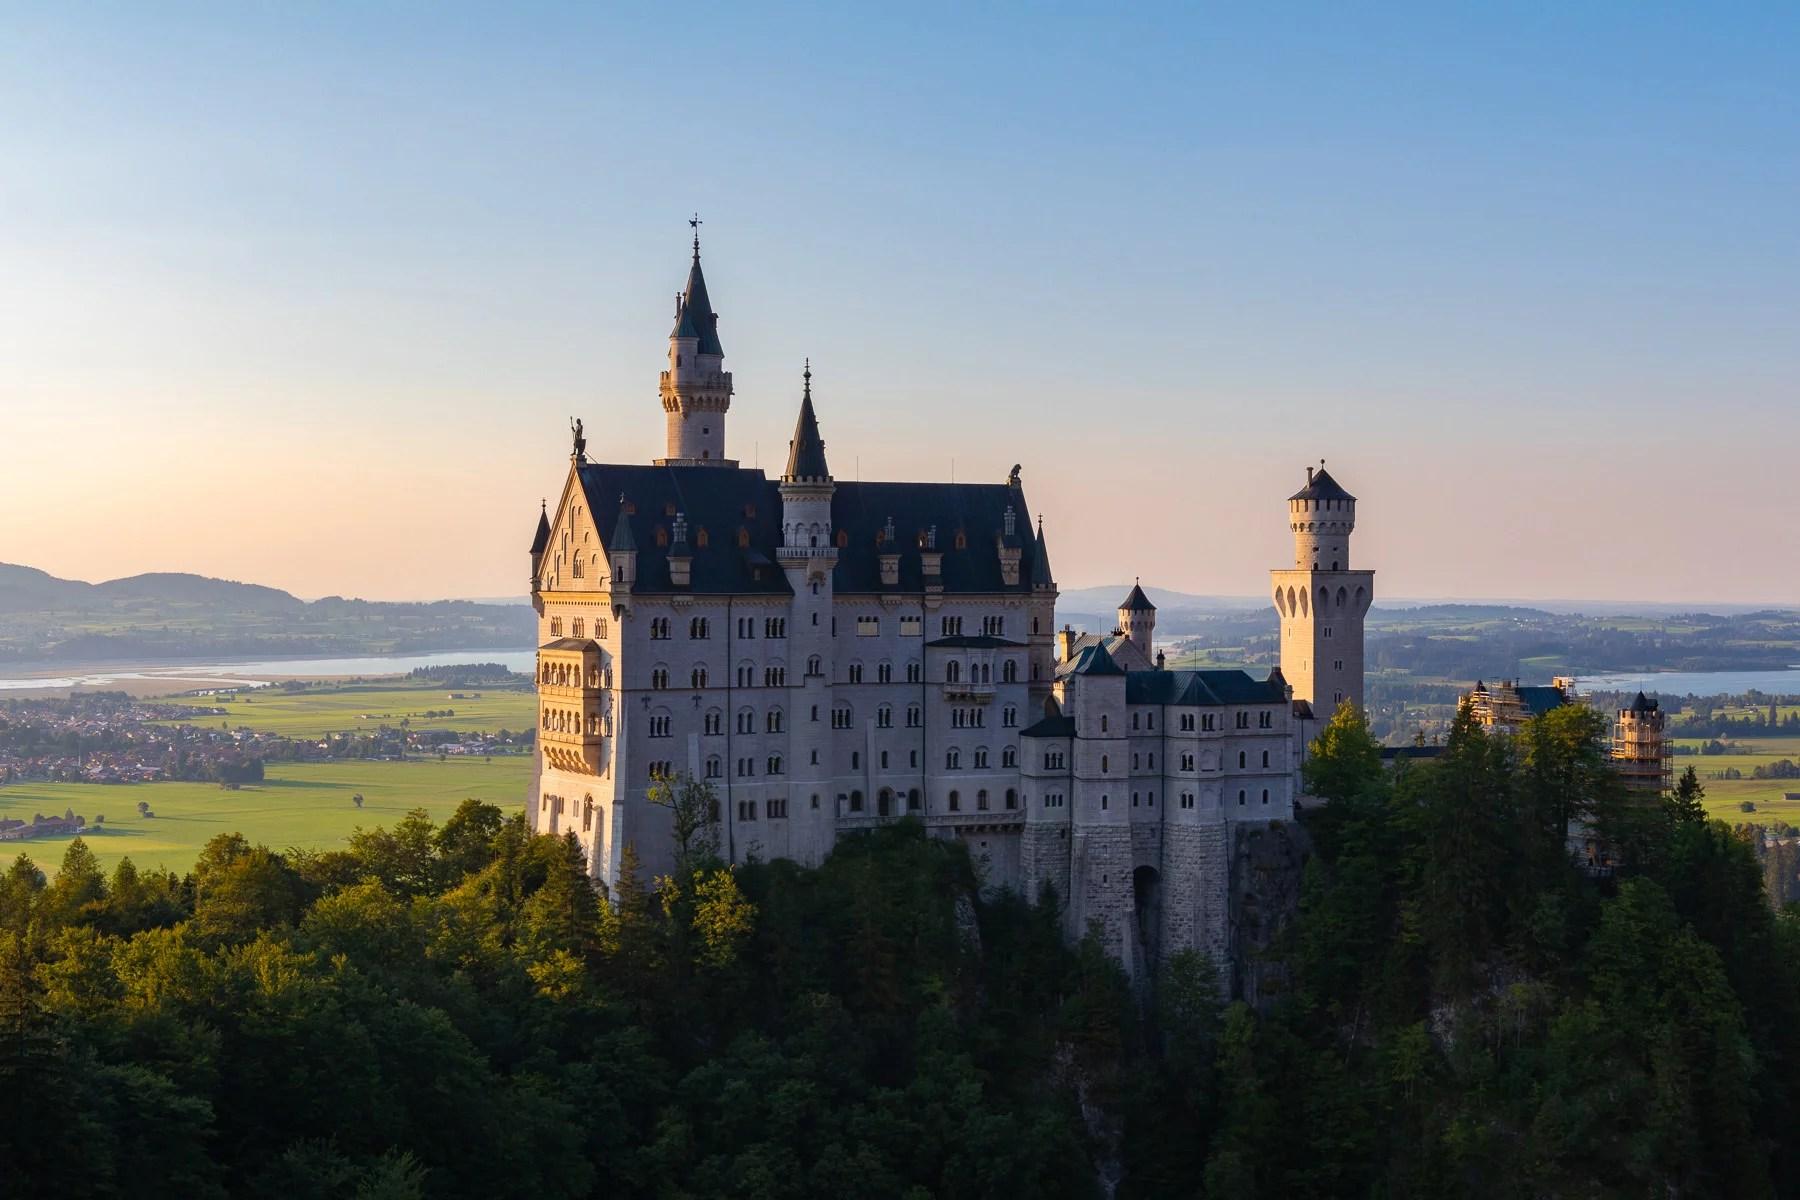 An afternoon view of castle Neuschwanstein from the Marienbrücke bridge